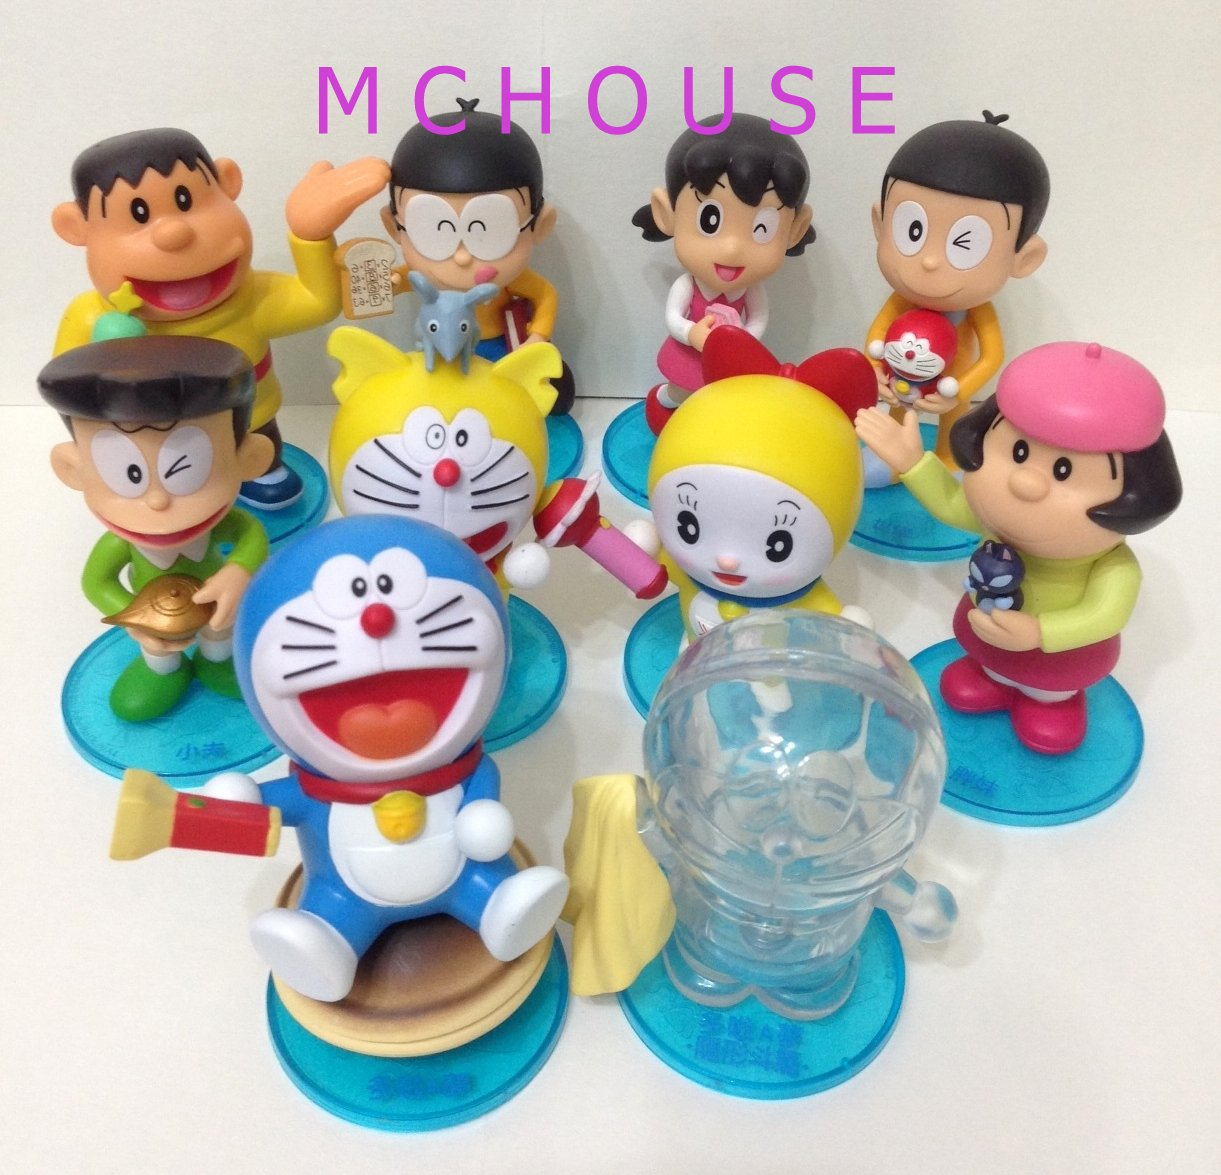 7-11 HK 2014 Doraemon and Friends Make a wish Figurines 1 set (10pcs)